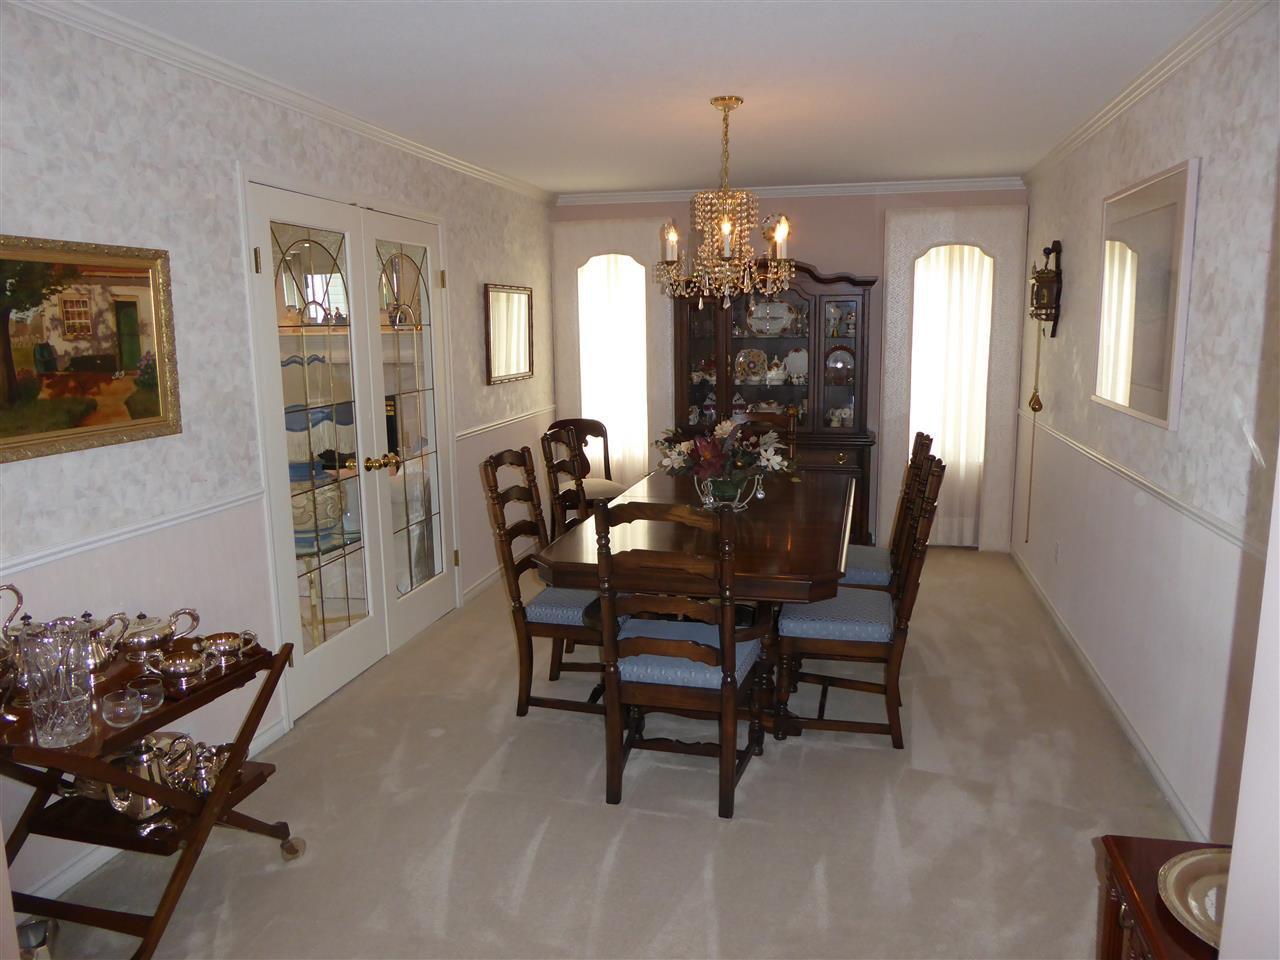 Photo 5: Photos: 1252 DEWAR Way in Port Coquitlam: Citadel PQ House for sale : MLS®# R2199639